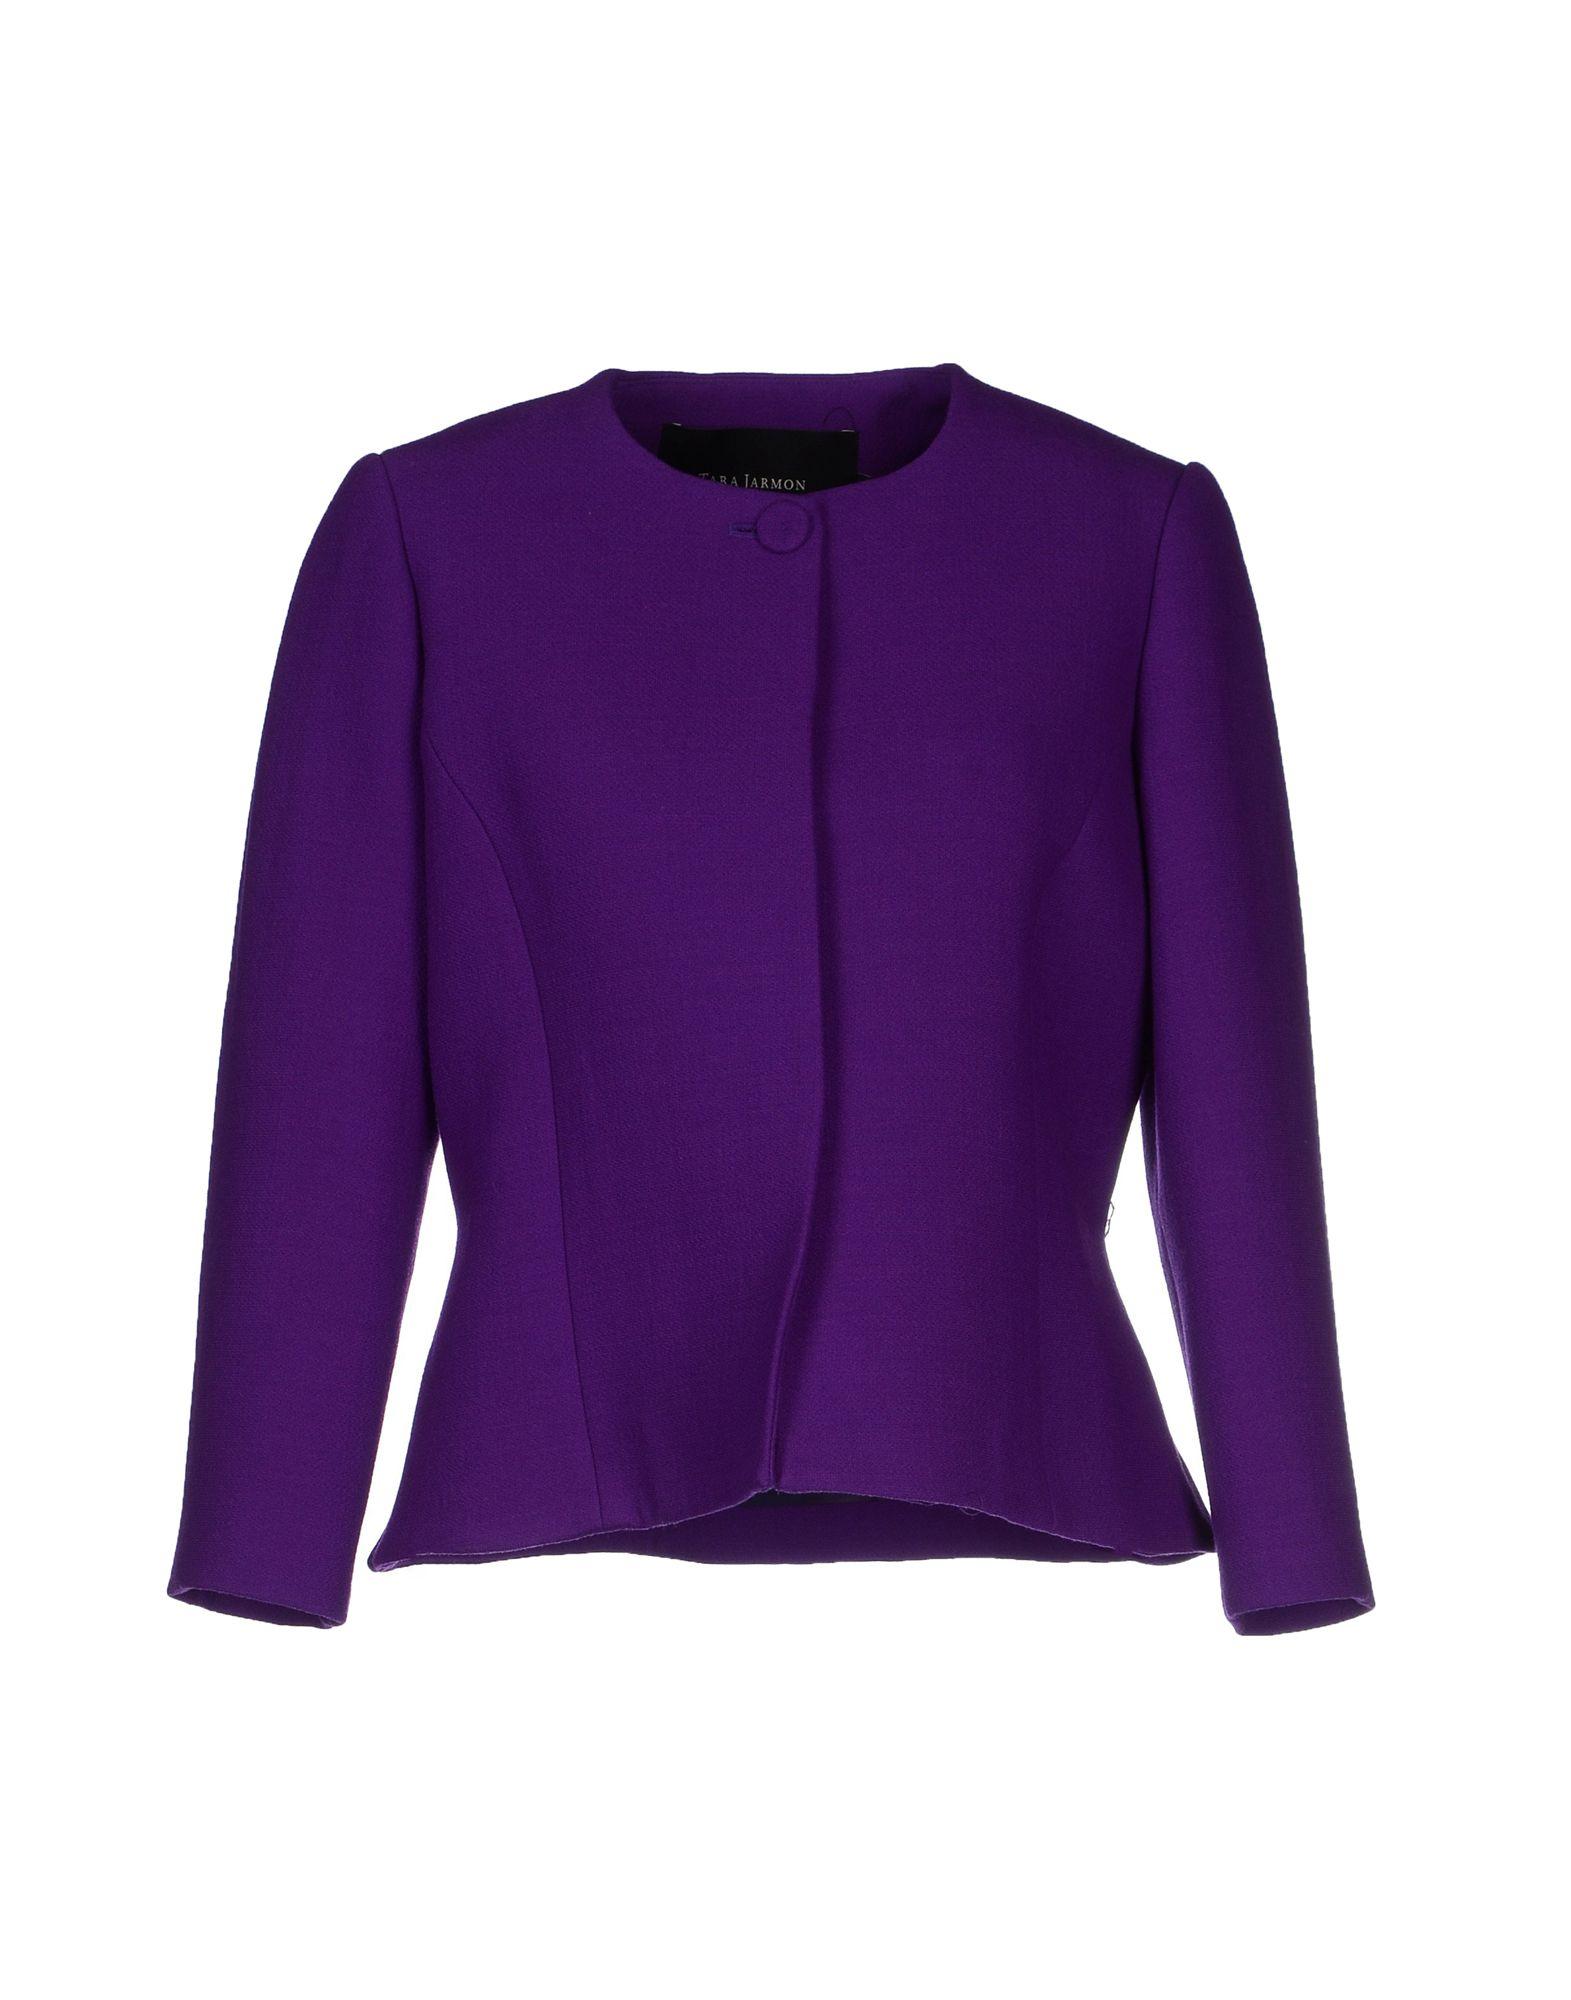 tara-jarmon-purple-blazer-product-2-684374281-normal.jpeg